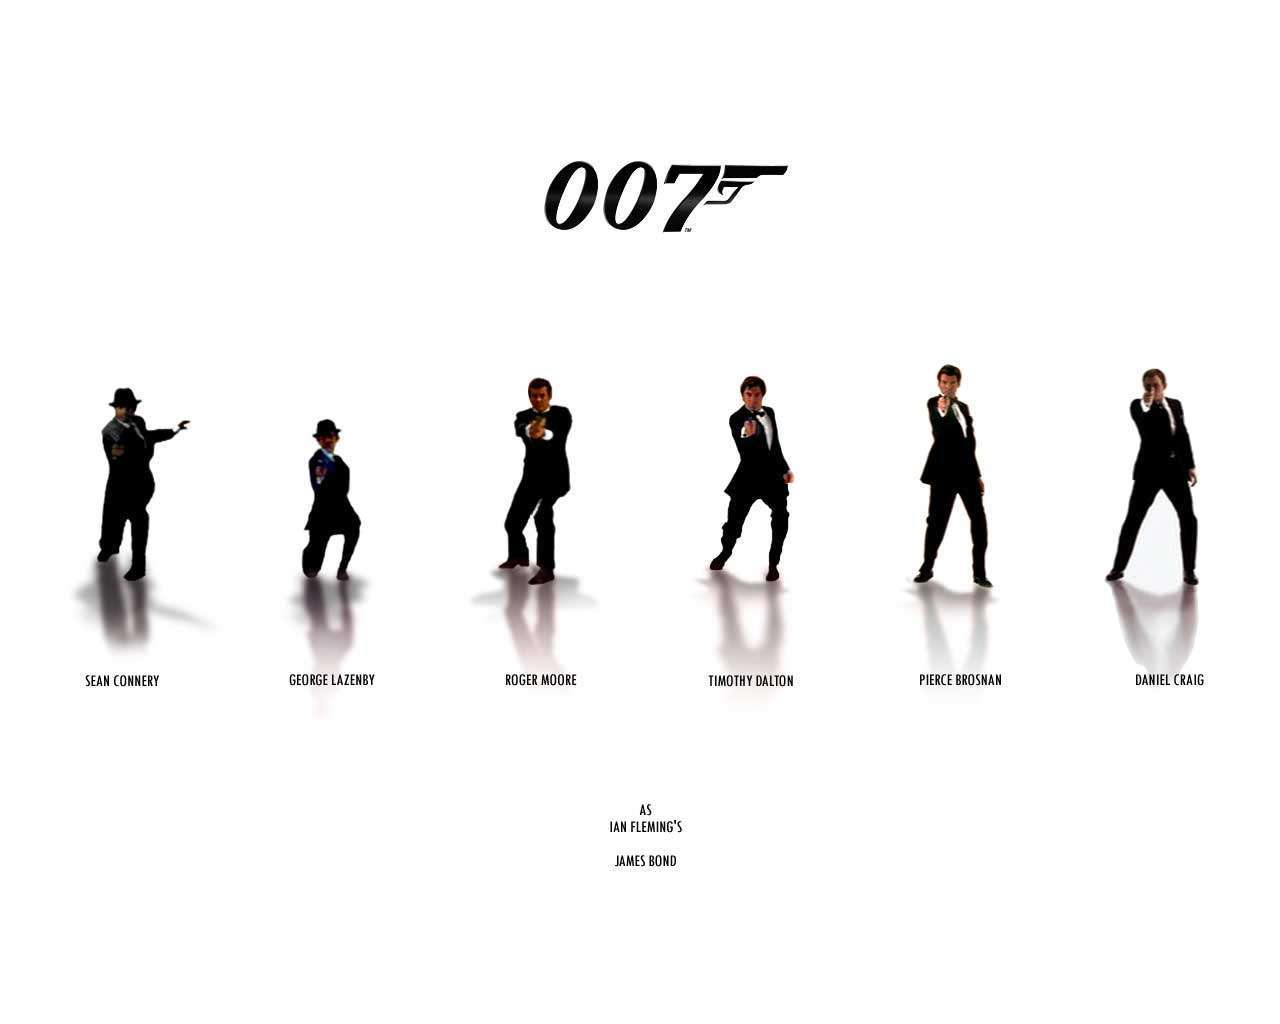 download  Spectre 007 hd wallpapers 8 1280x1024